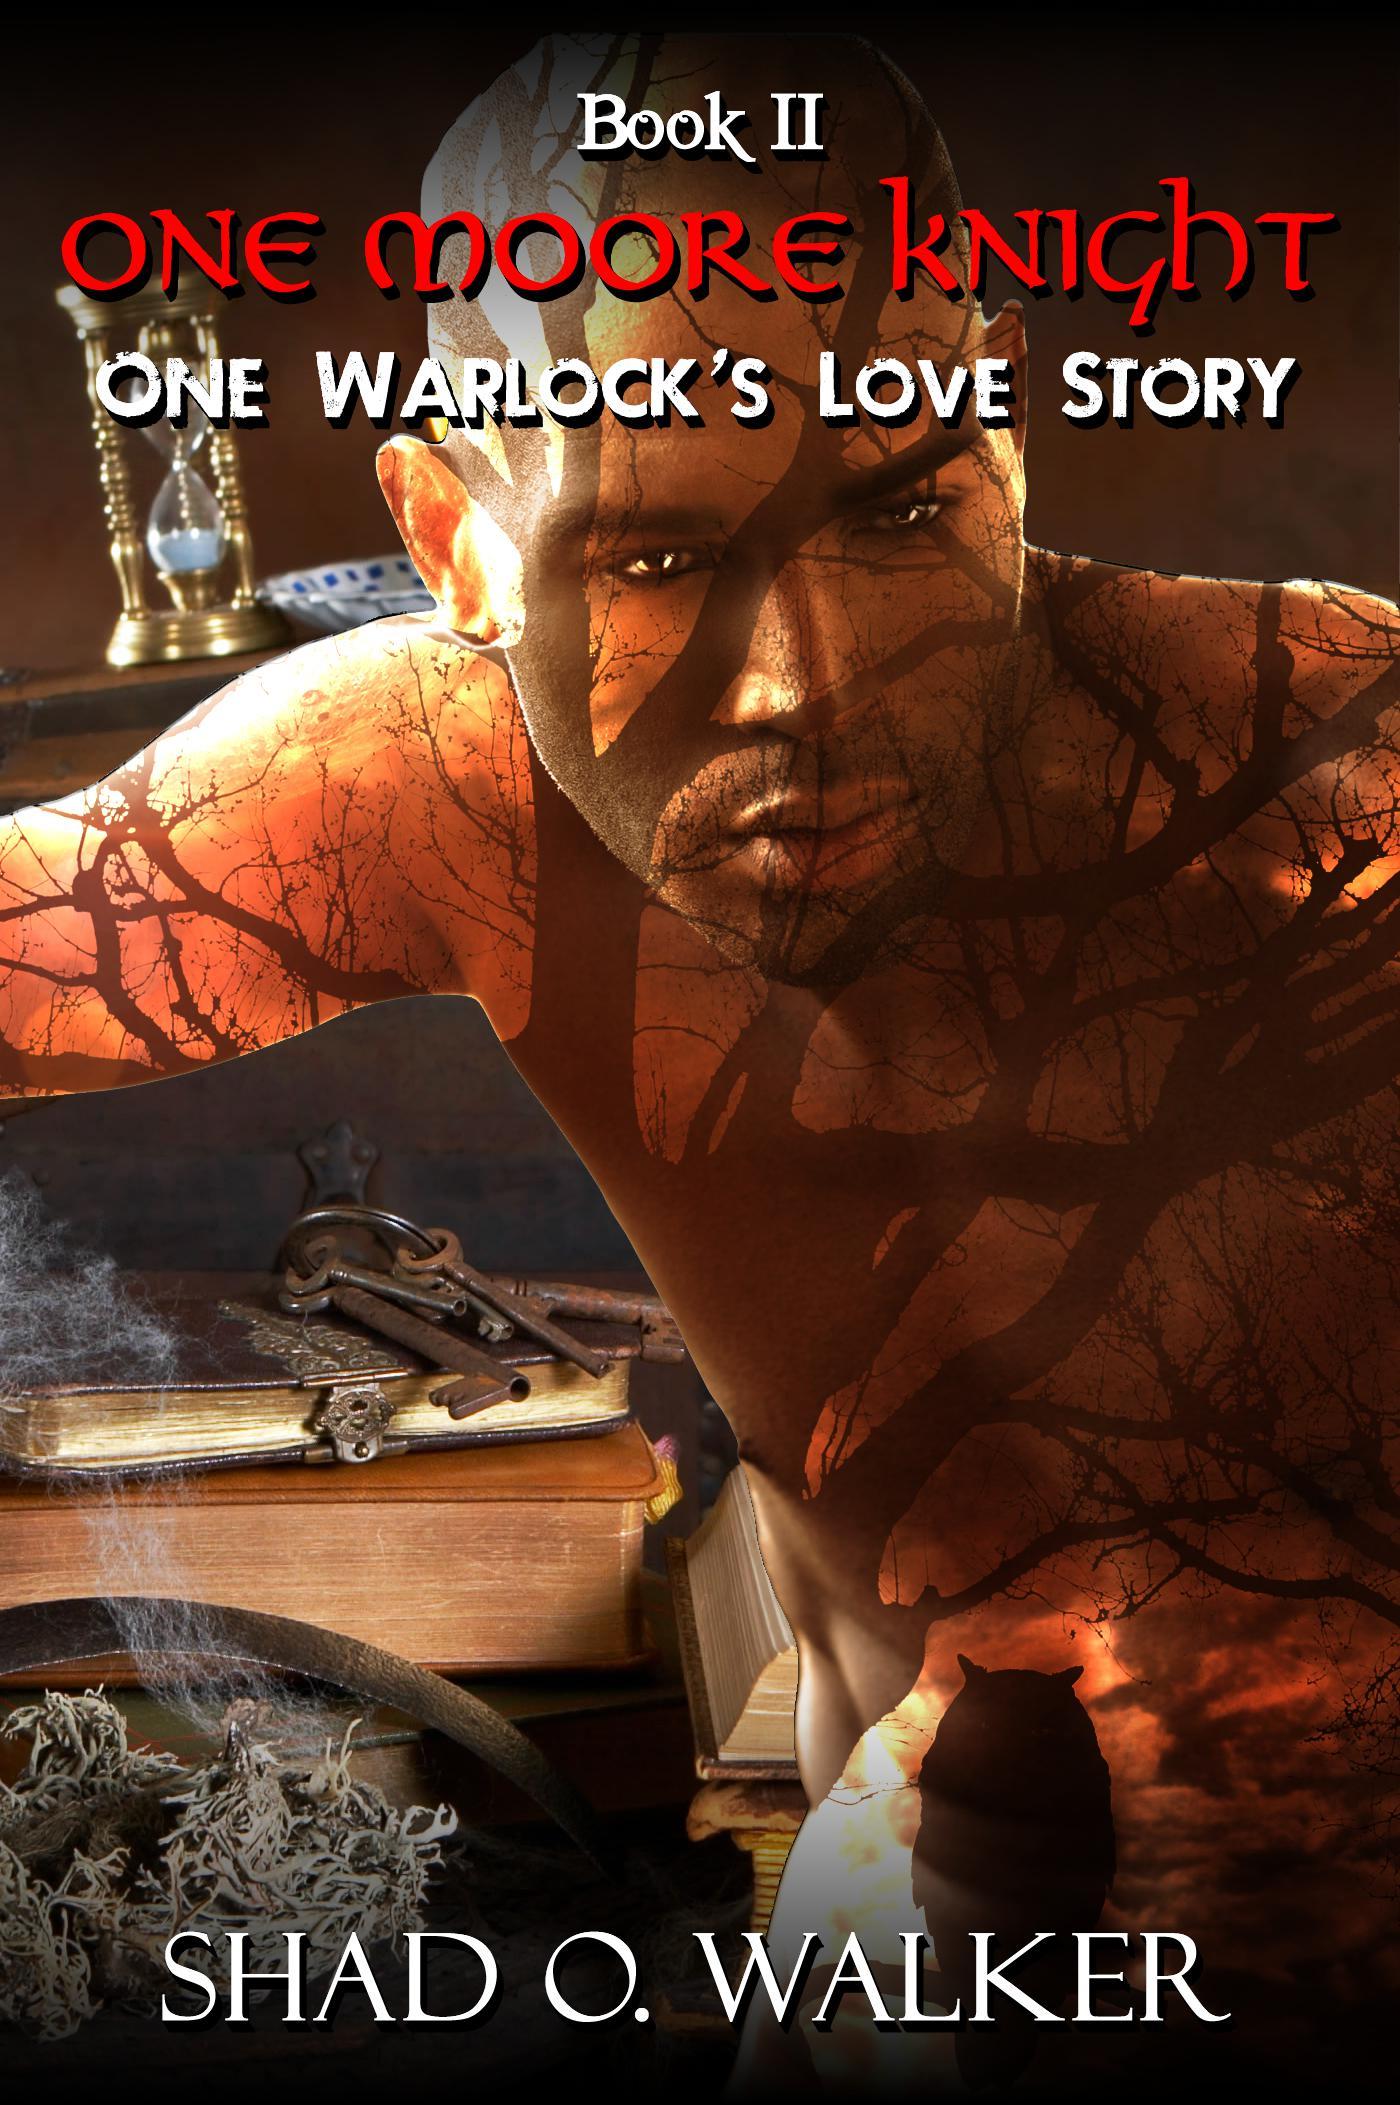 Black warlock young adult book, Bar refaeli nude video